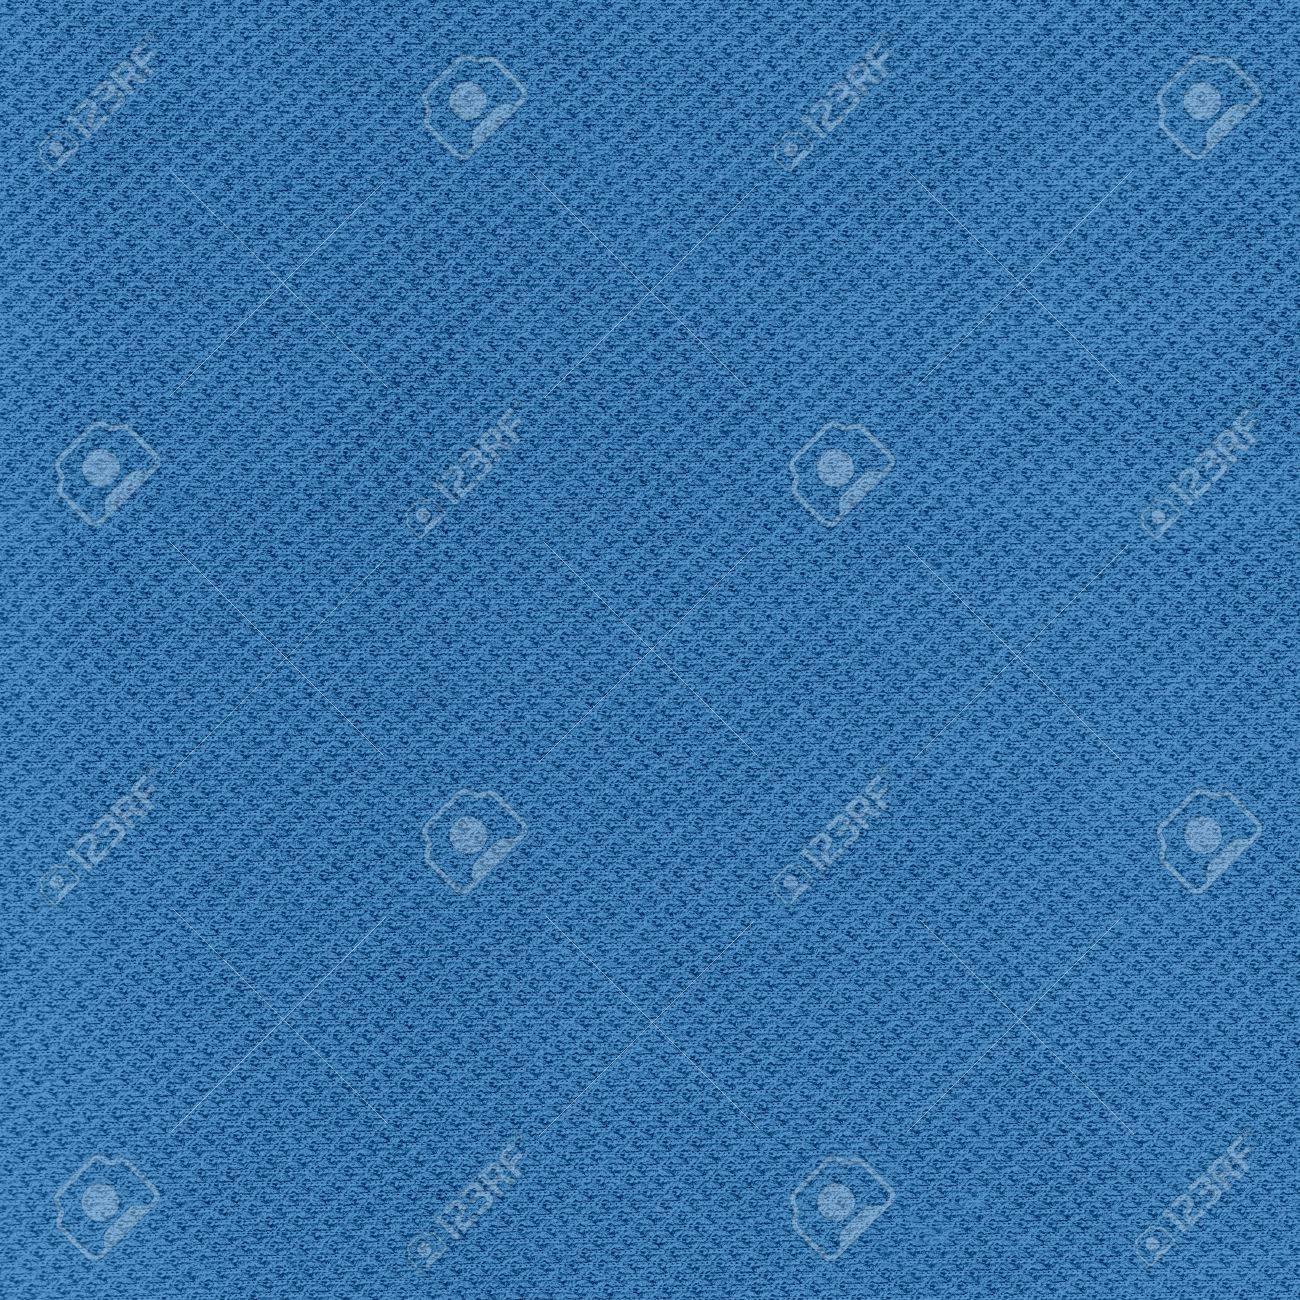 Blue Sport Jersey Mesh Textile Stock Photo - 16707944